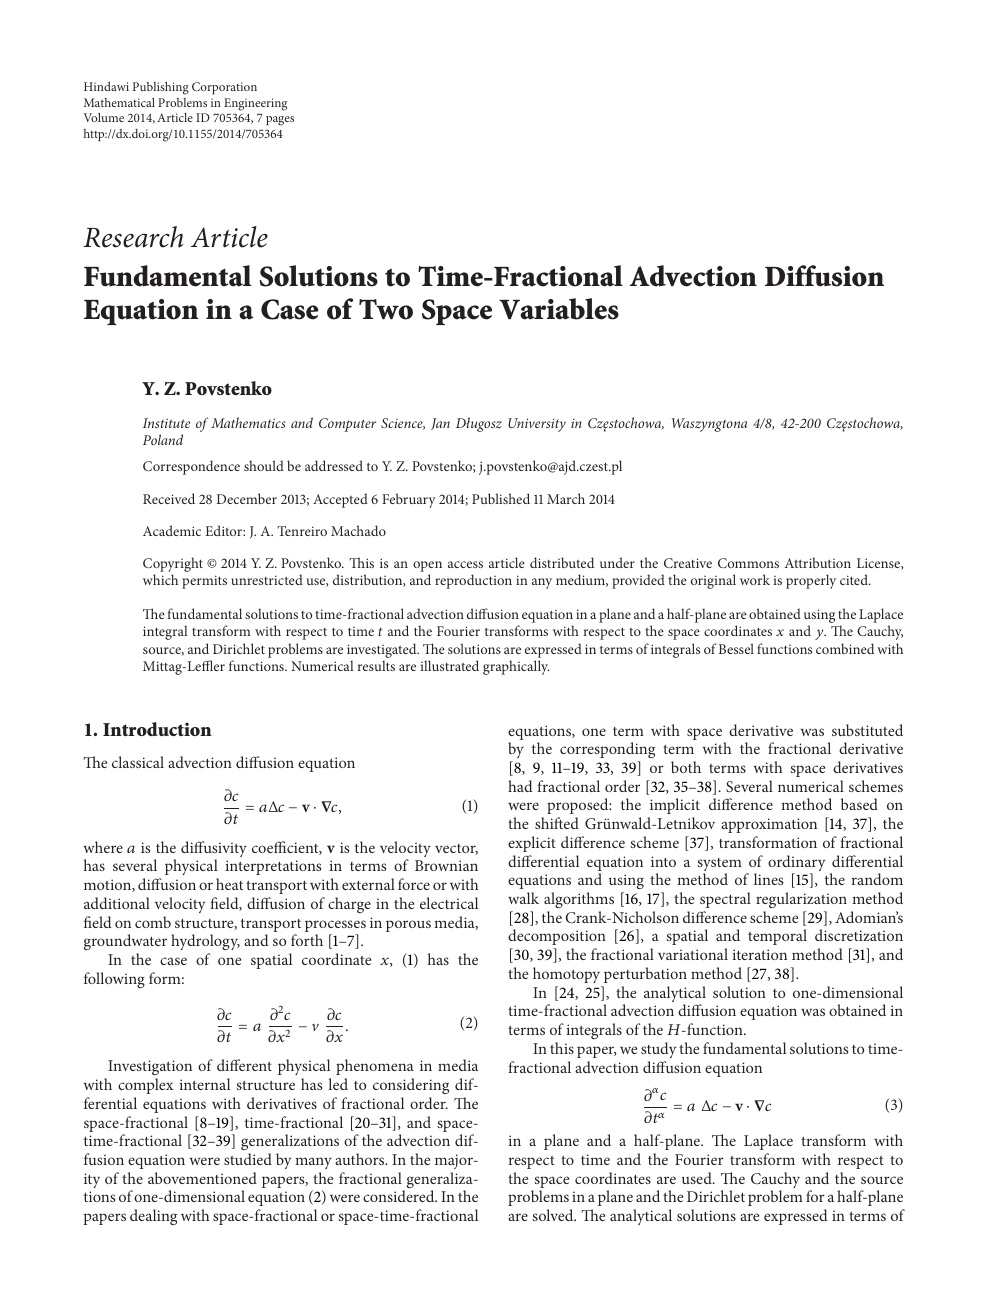 Pdf of the mathematics diffusion crank